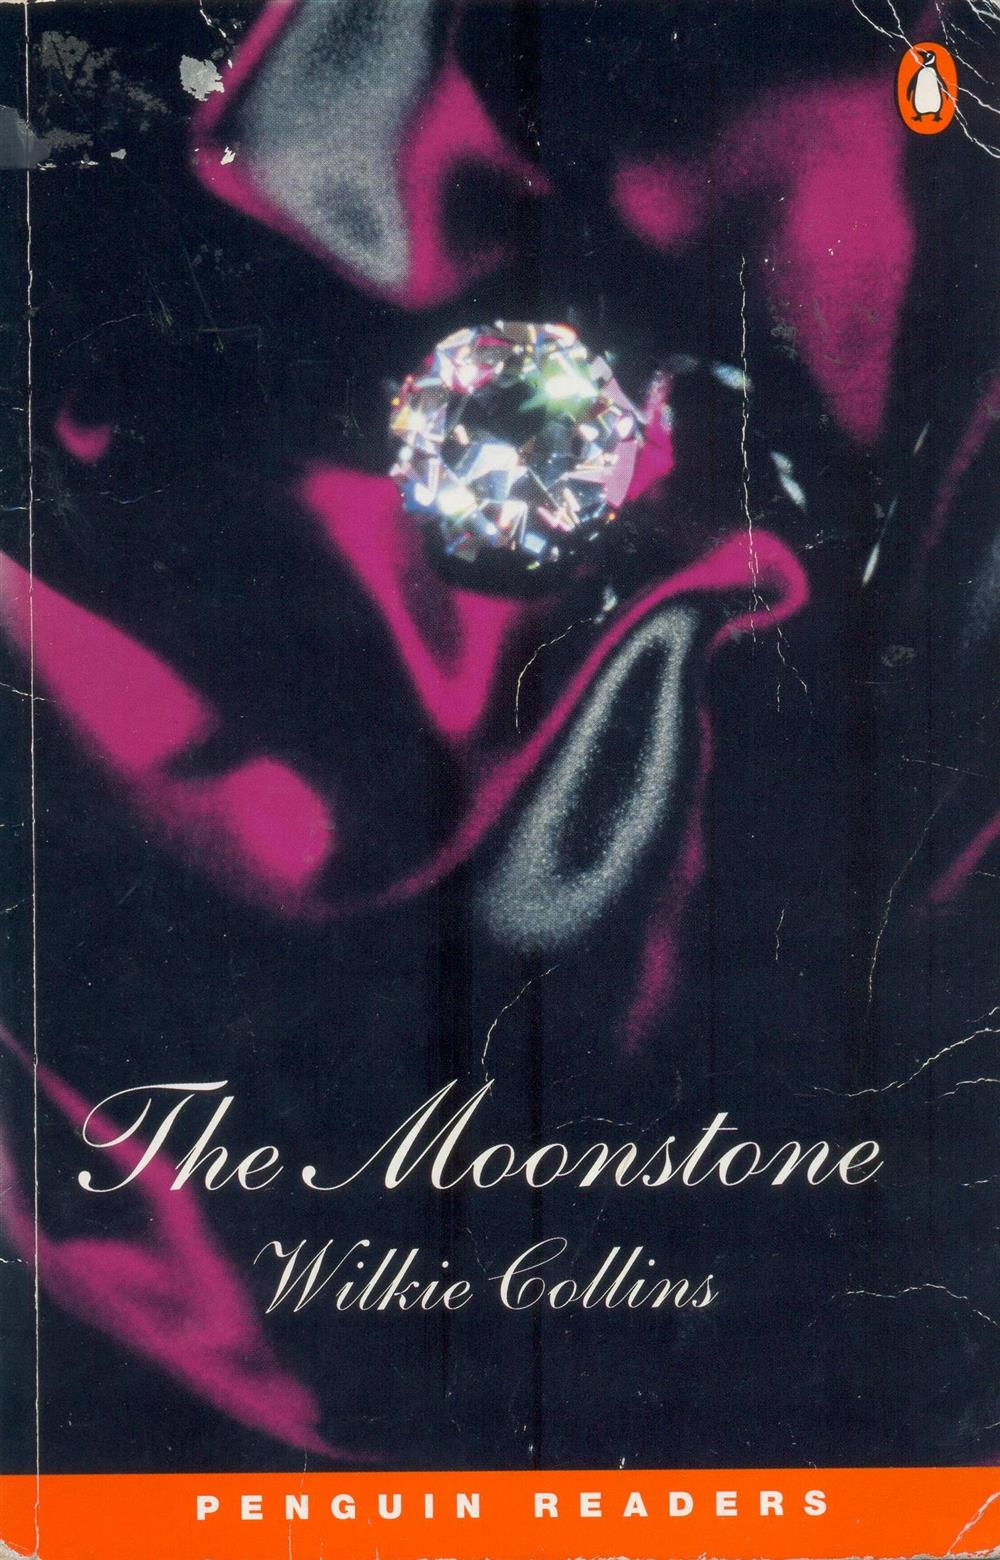 The moonstone 001.jpg